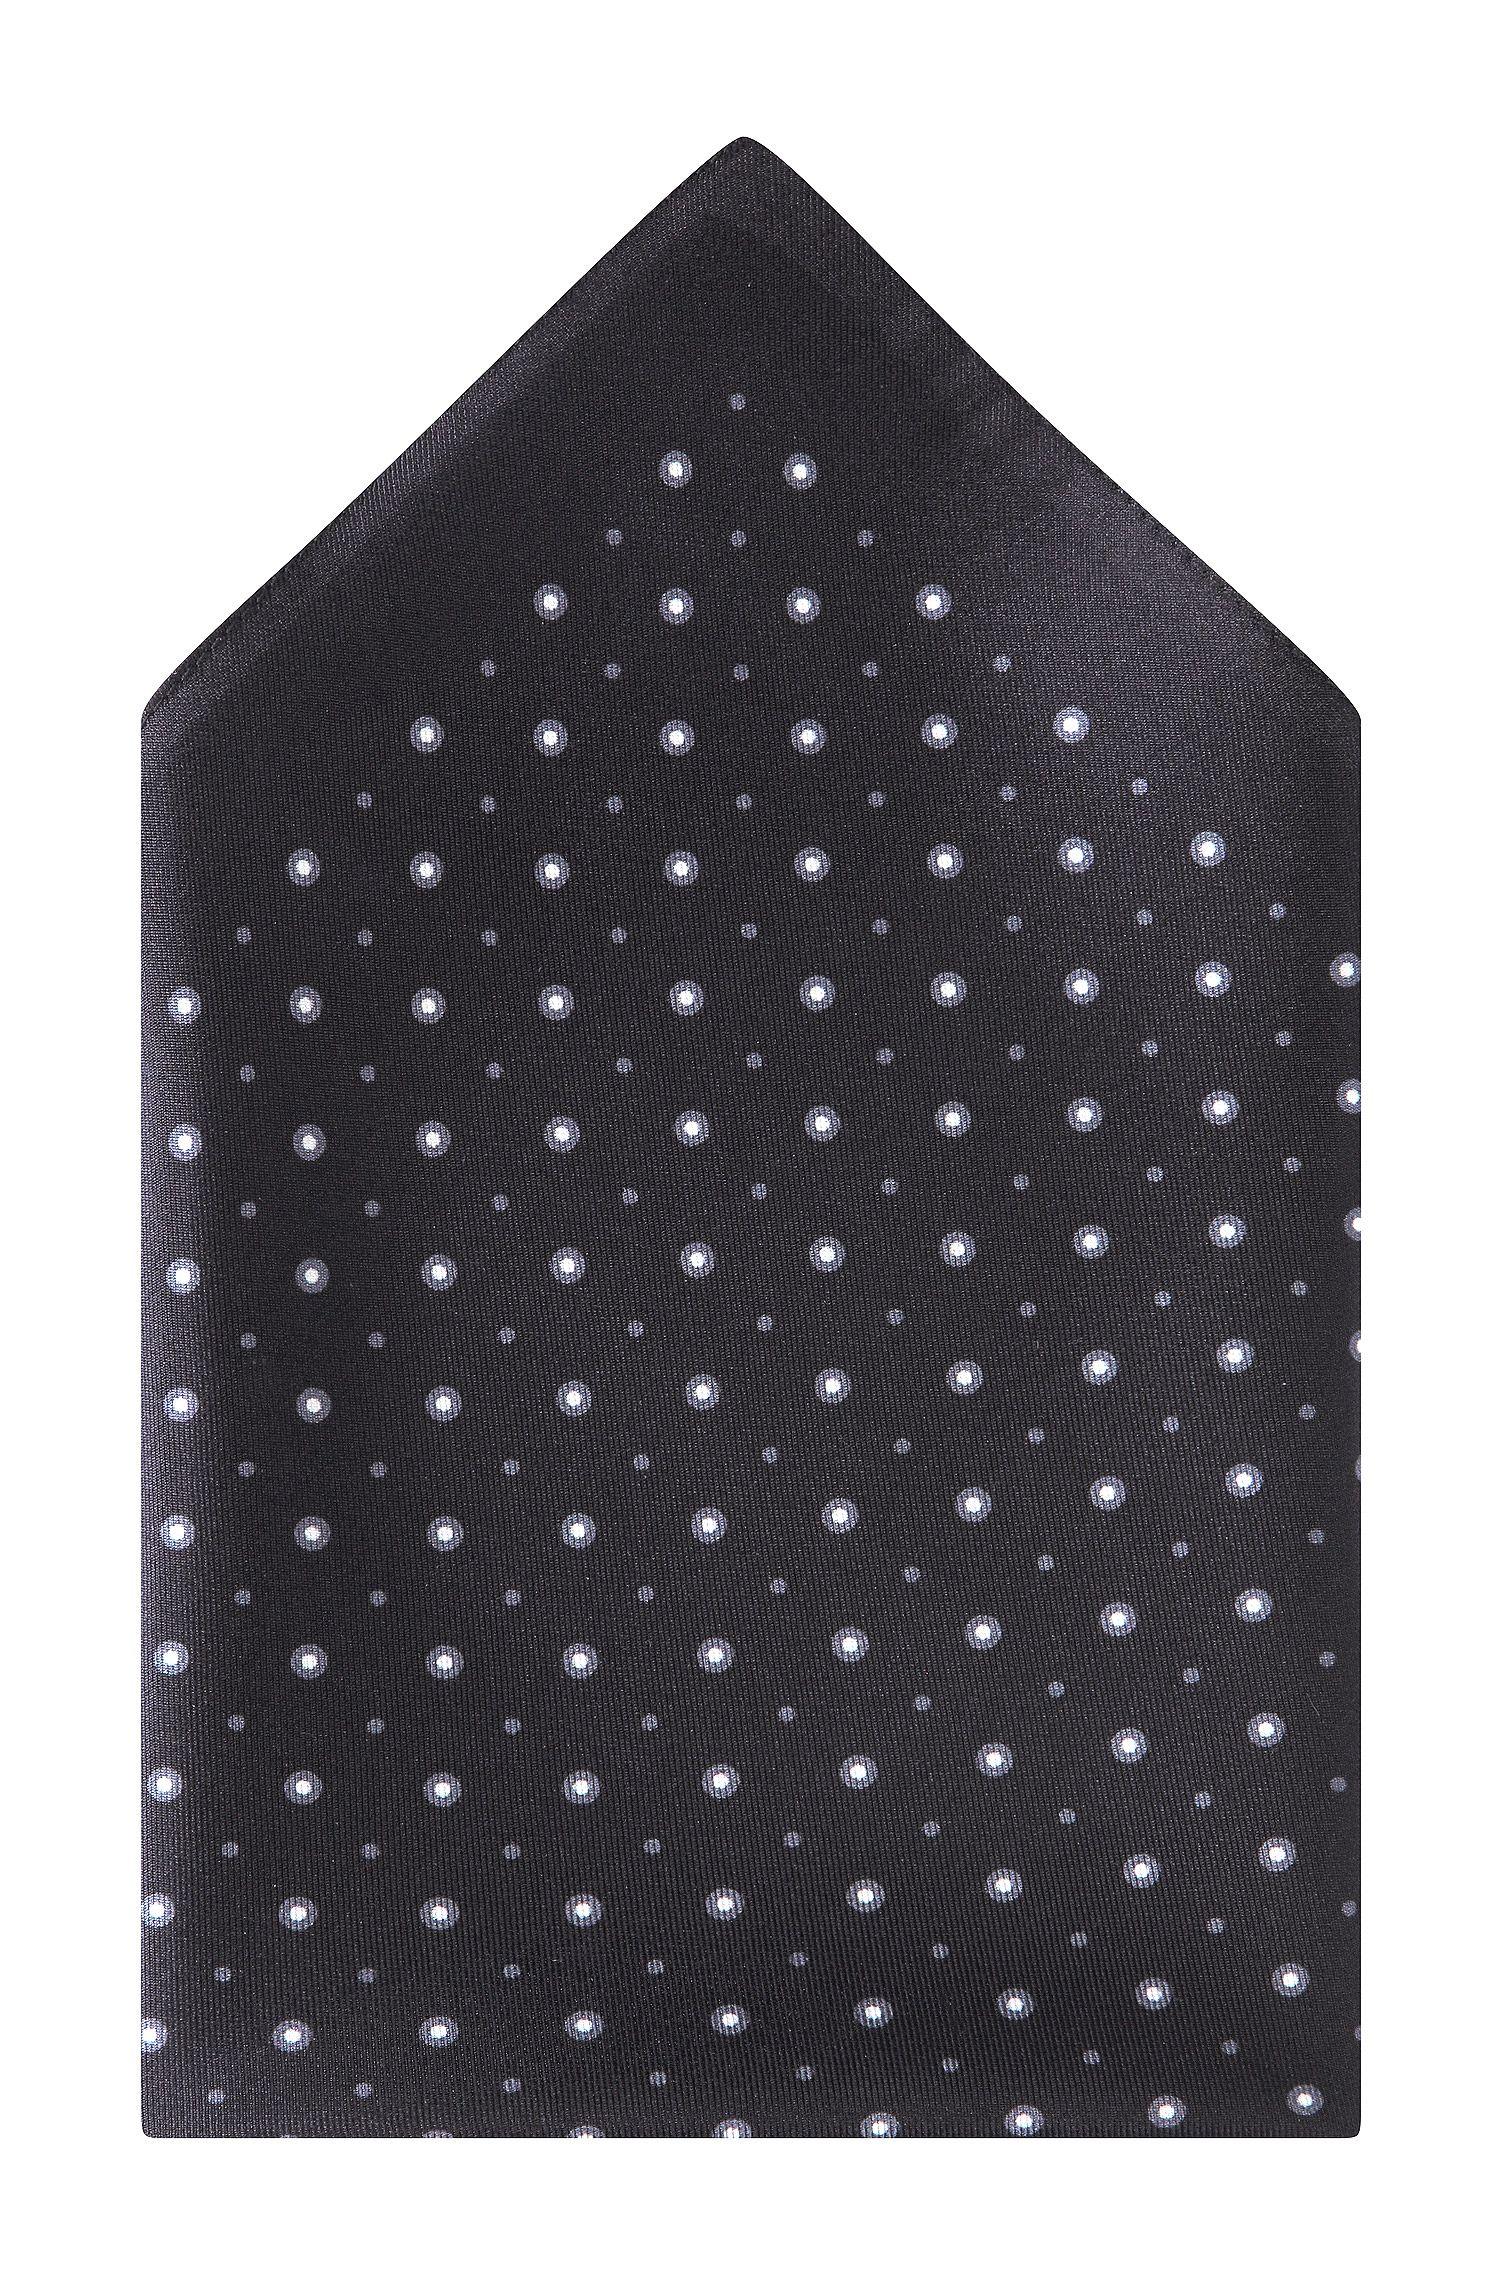 Pochet ´Pocket square 33x33` van zijde